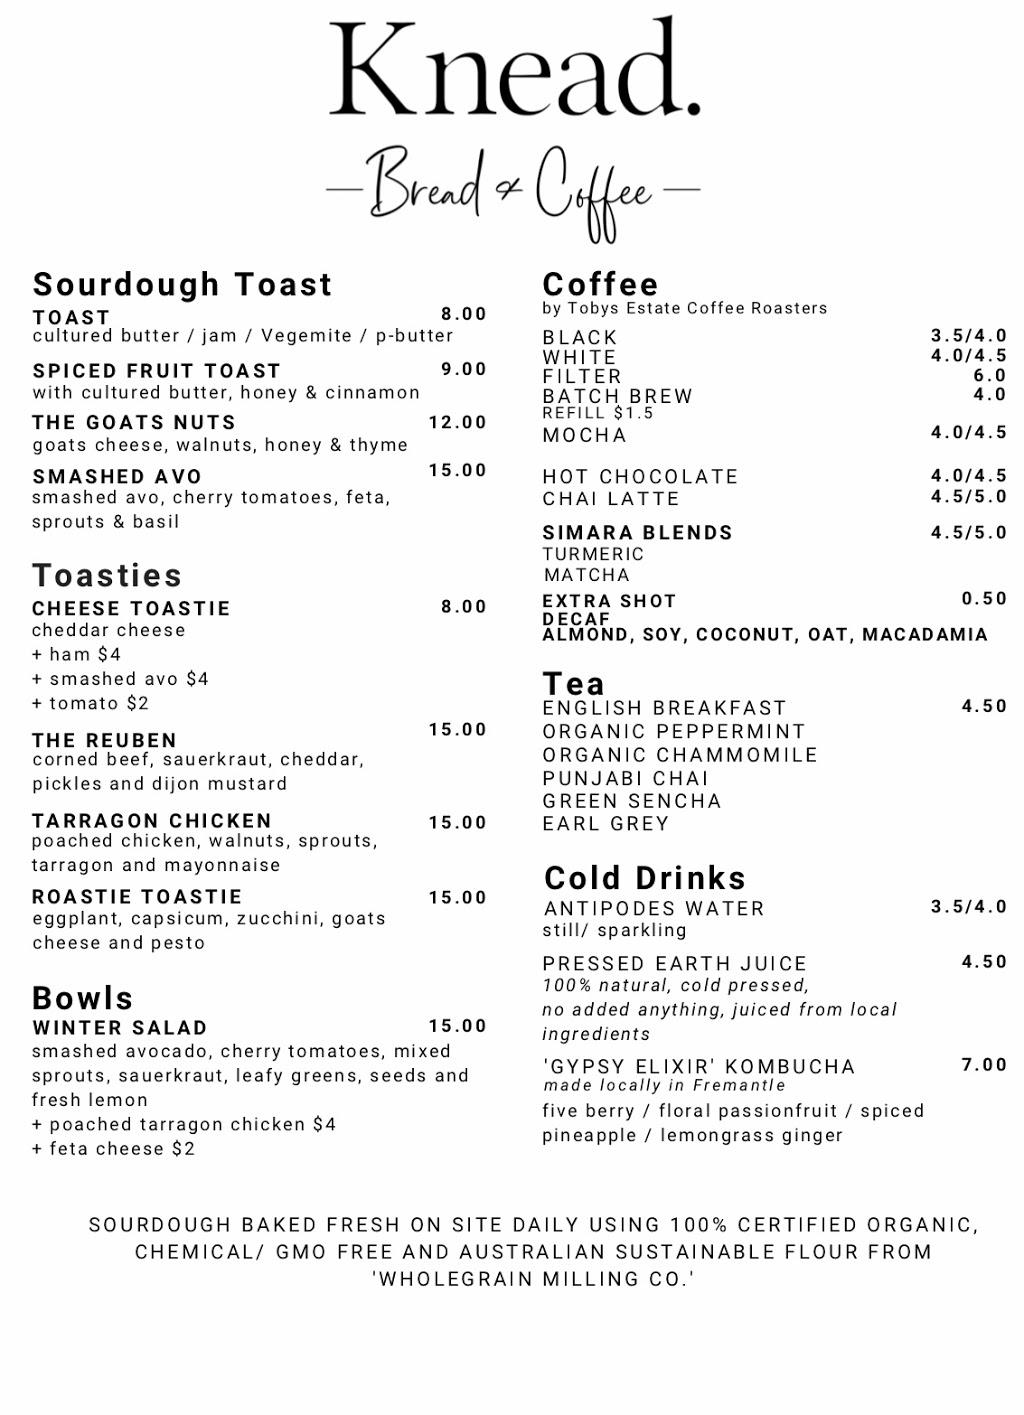 Knead - Bread and Coffee   cafe   Luna Maxi Mart Shopping Centre, 6 Scarborough Beach Rd, Scarborough WA 6019, Australia